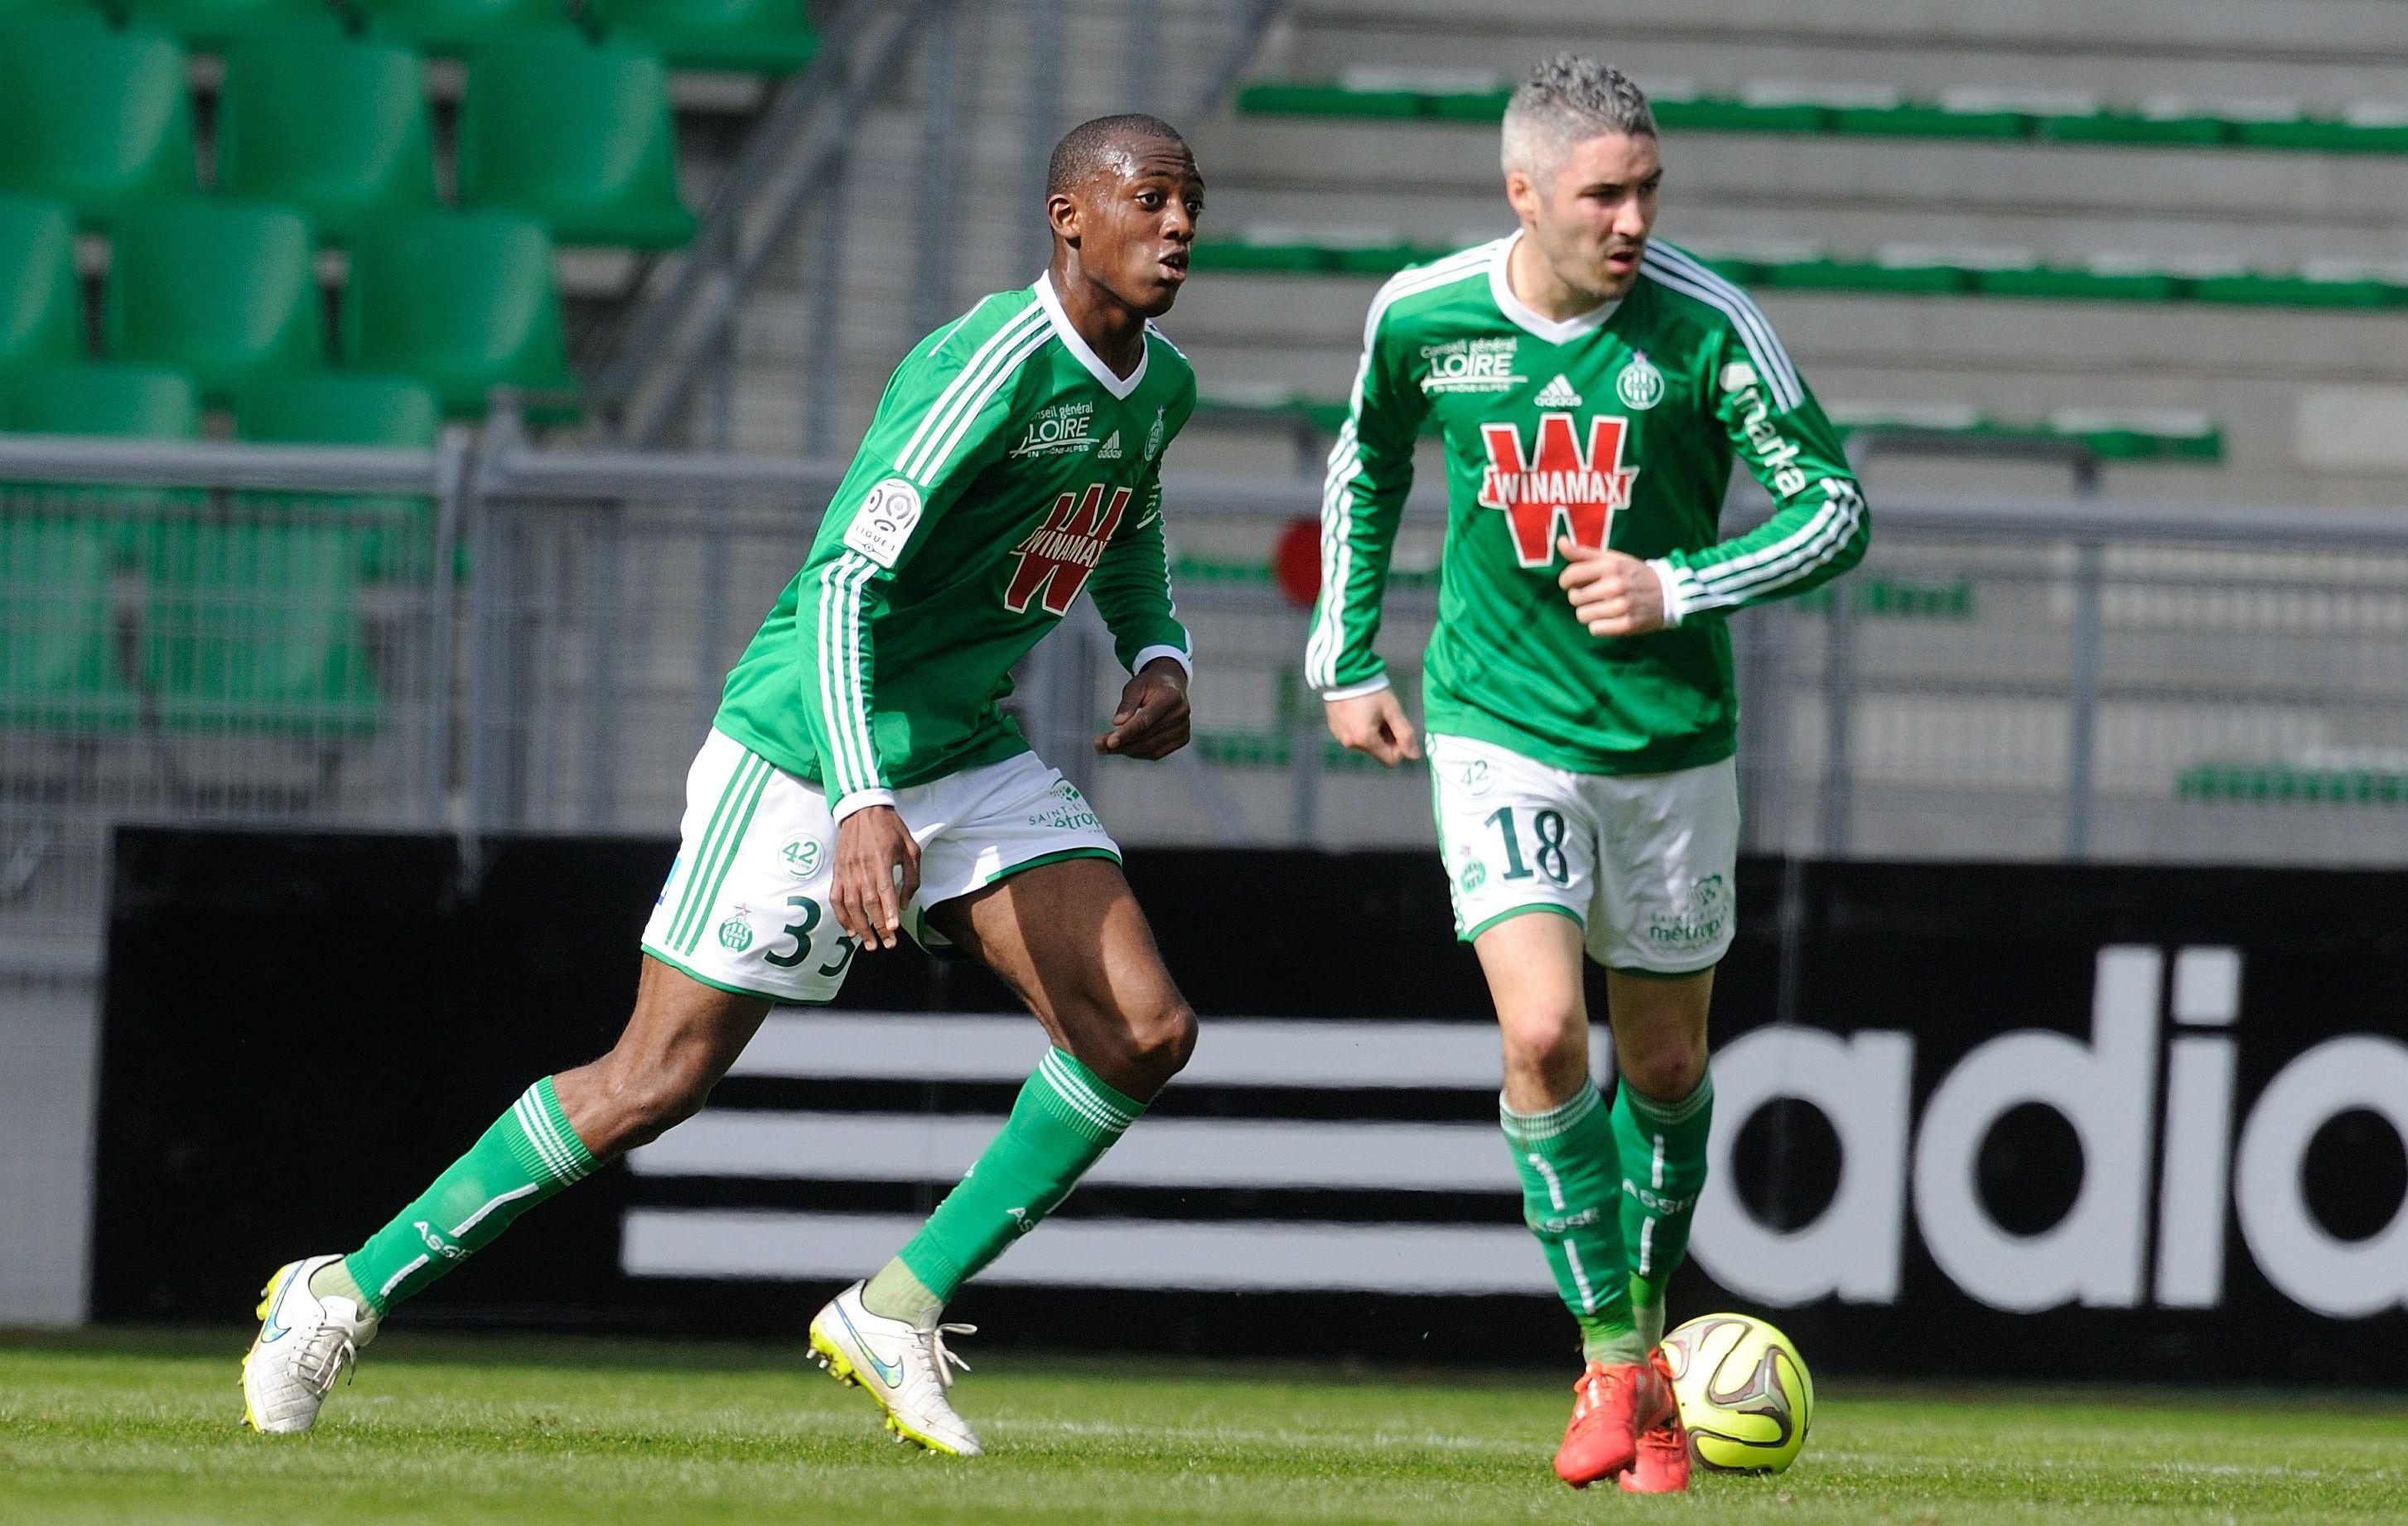 Saint etienne objectif europe saint etienne homes clubs ligue 1 football - St etienne coupe d europe ...